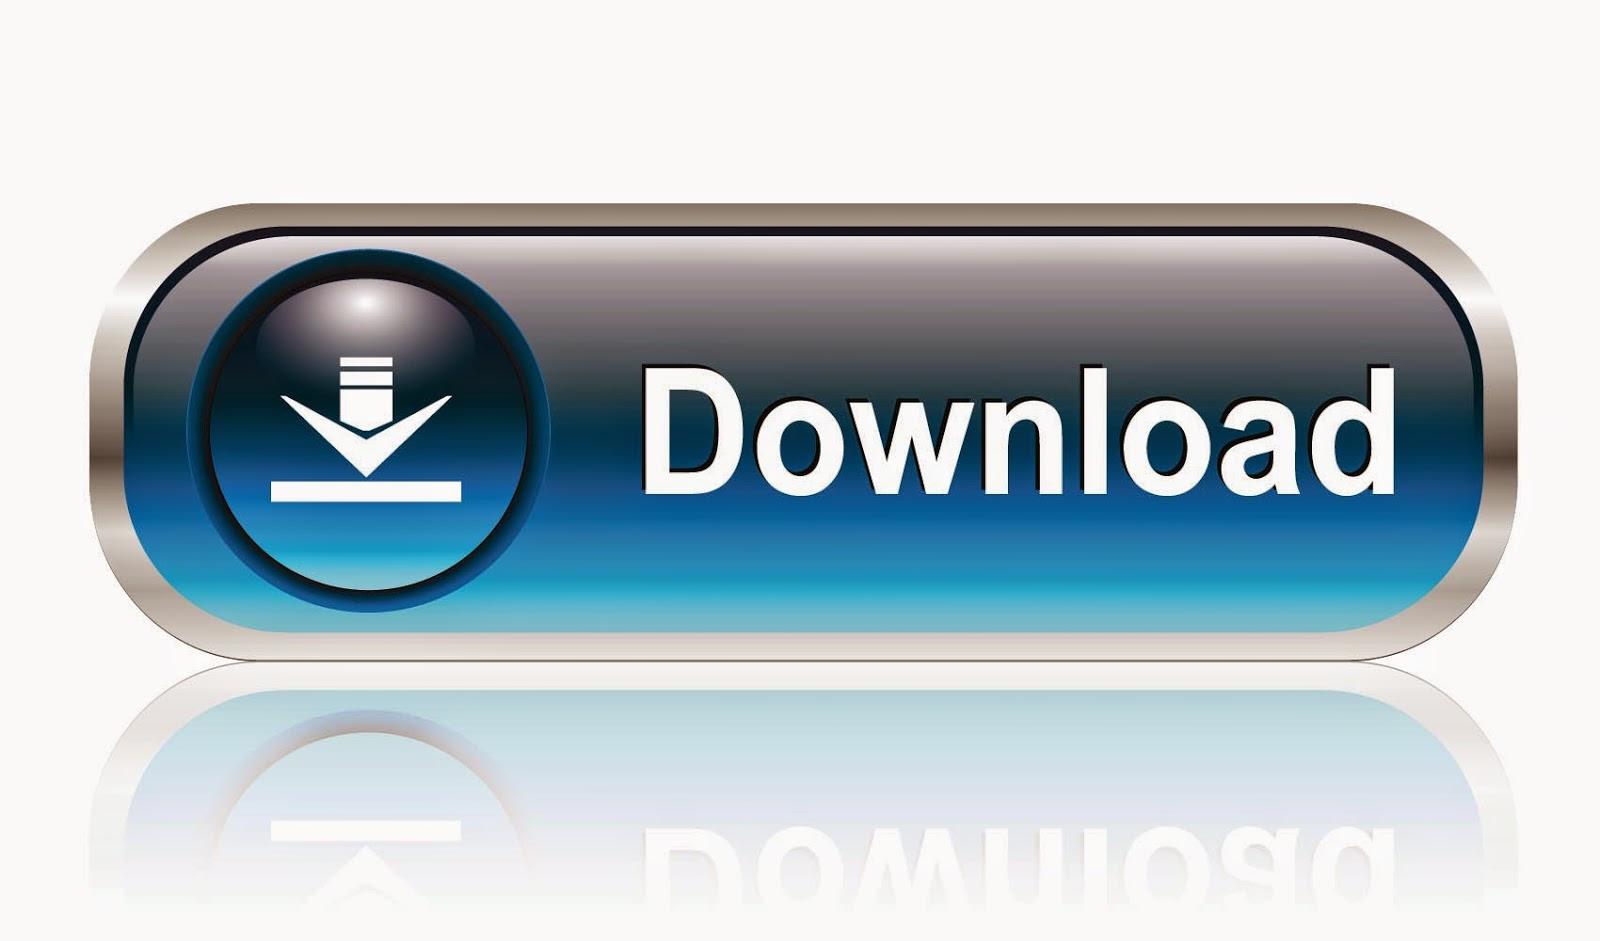 "<img src=""http://1.bp.blogspot.com/-23L9vA_Wn6A/U05znYRM8YI/AAAAAAAACTM/V65j2mHP9oA/s1600/vlc-media-player.jpg"" alt=""VLC Media Player Nightly 2.1.0 Free Download"" />"